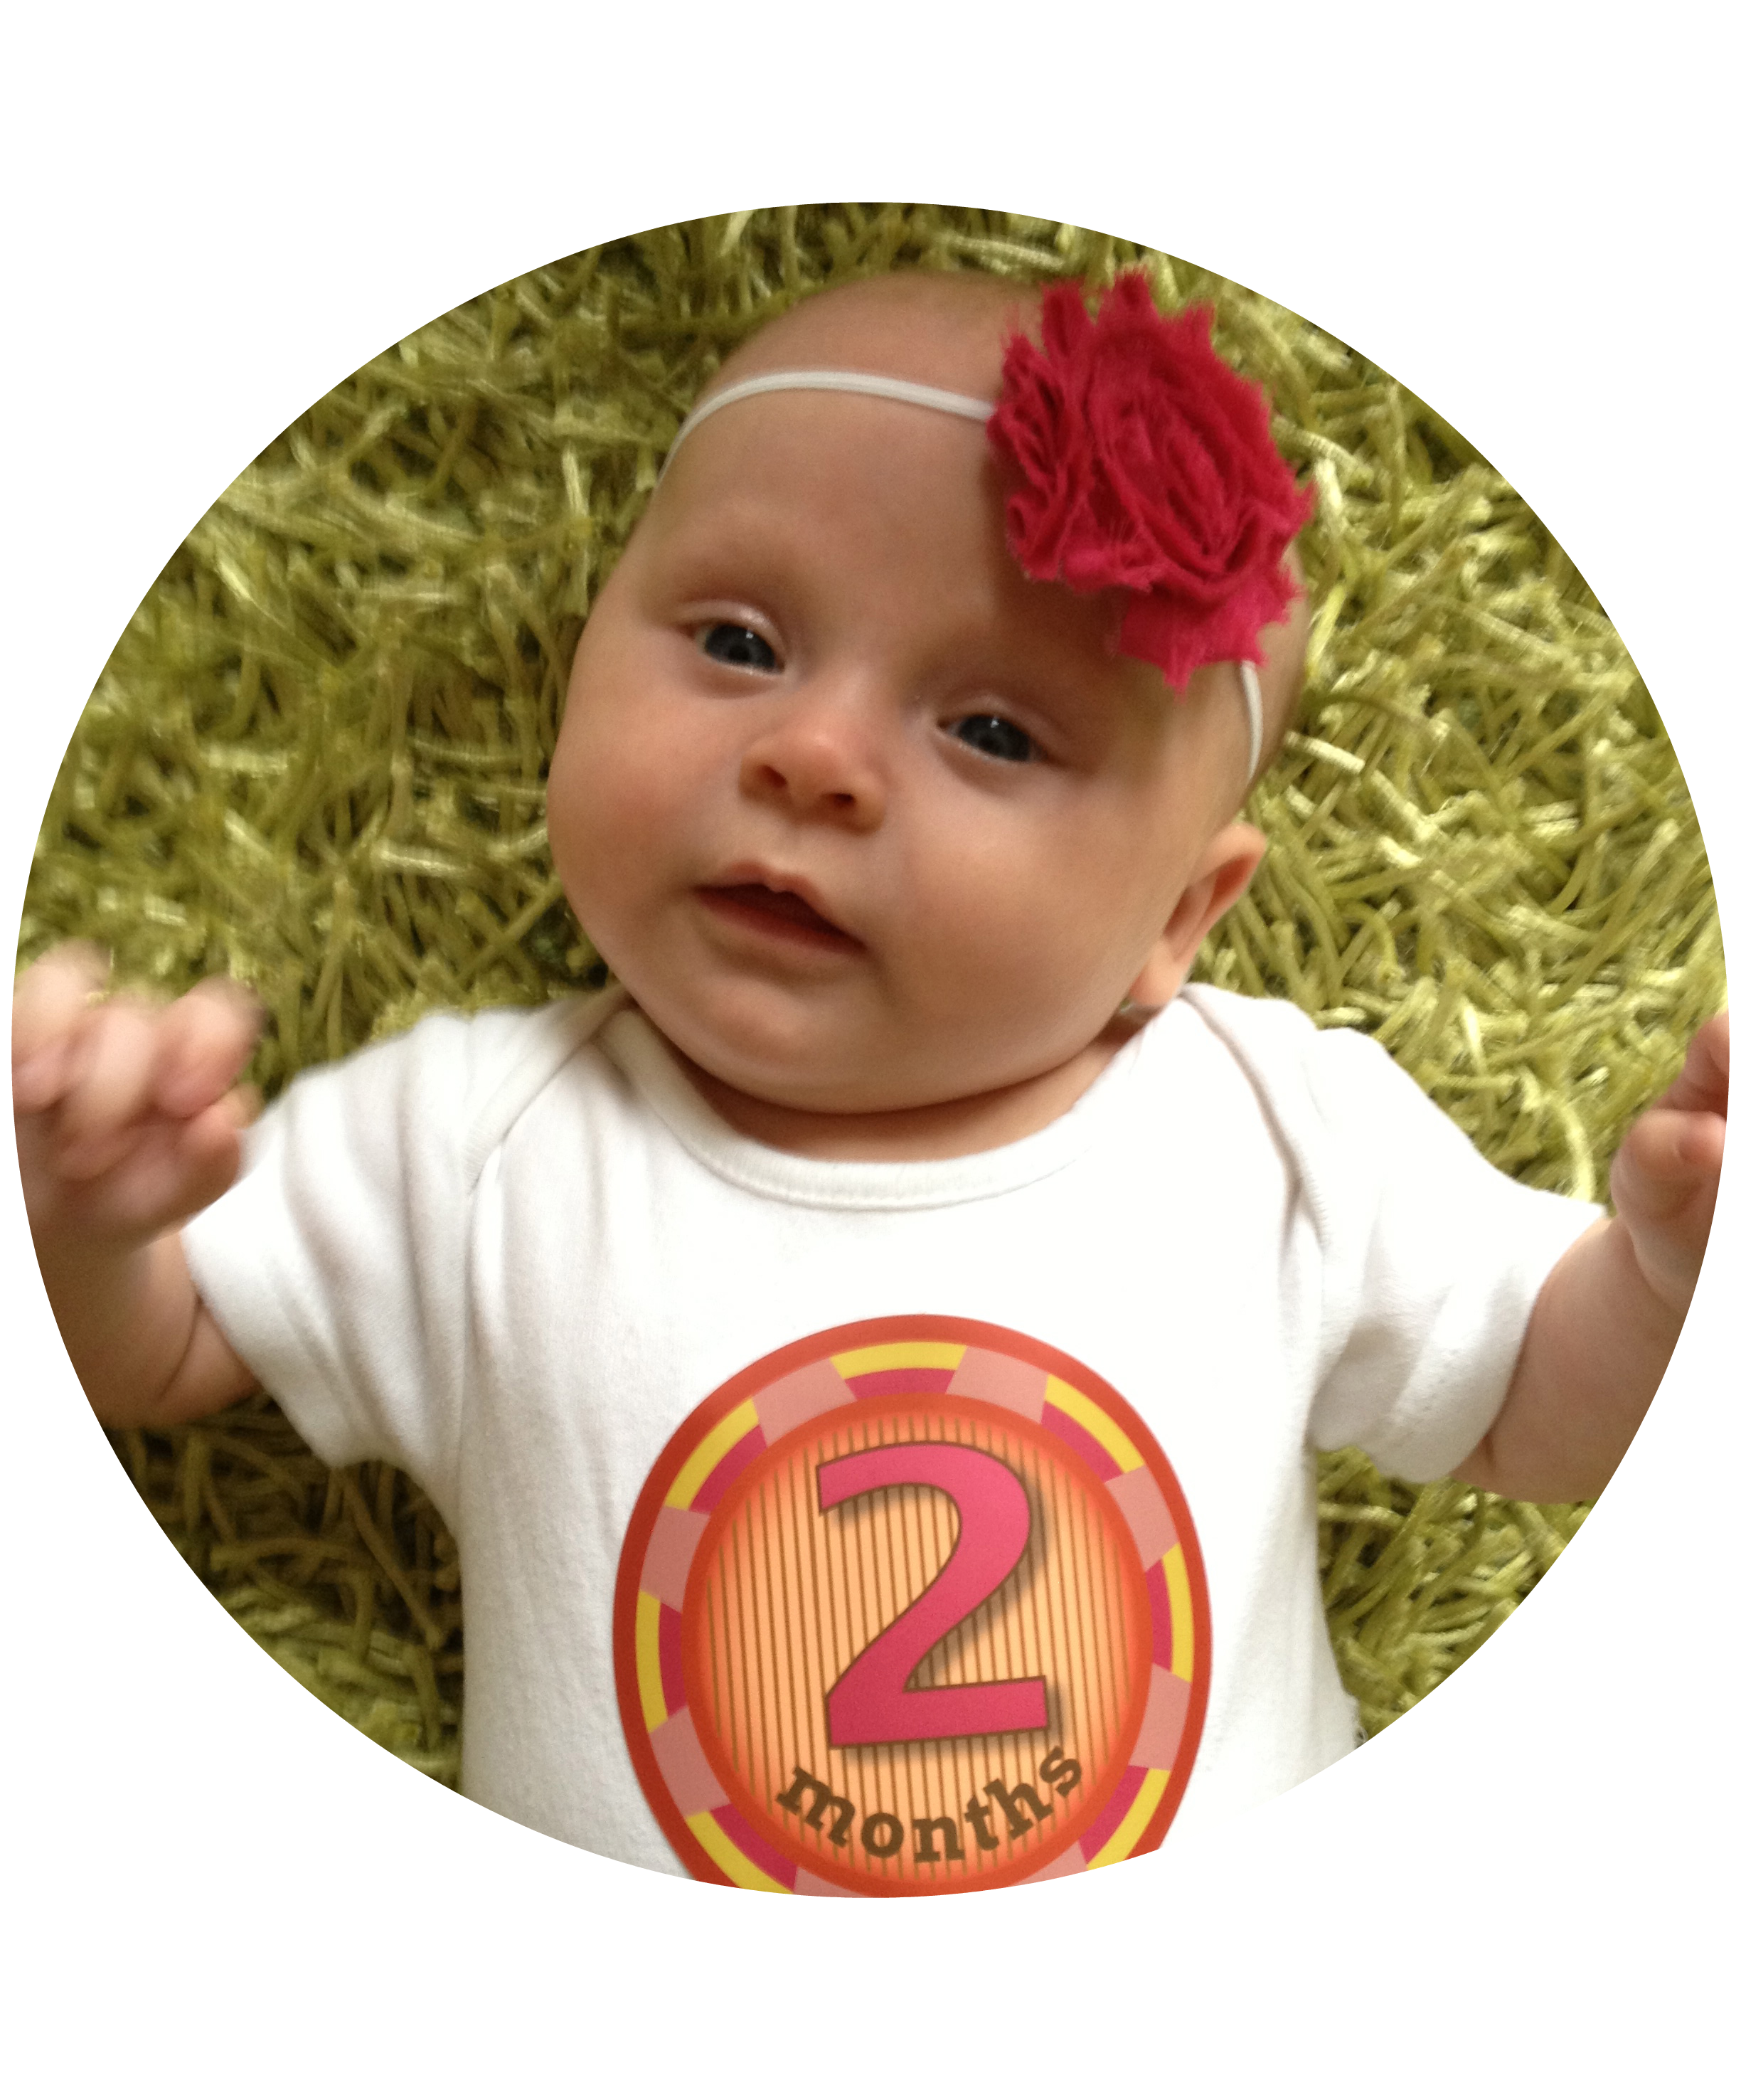 Missy Moo's Milestones: 6 Months Old